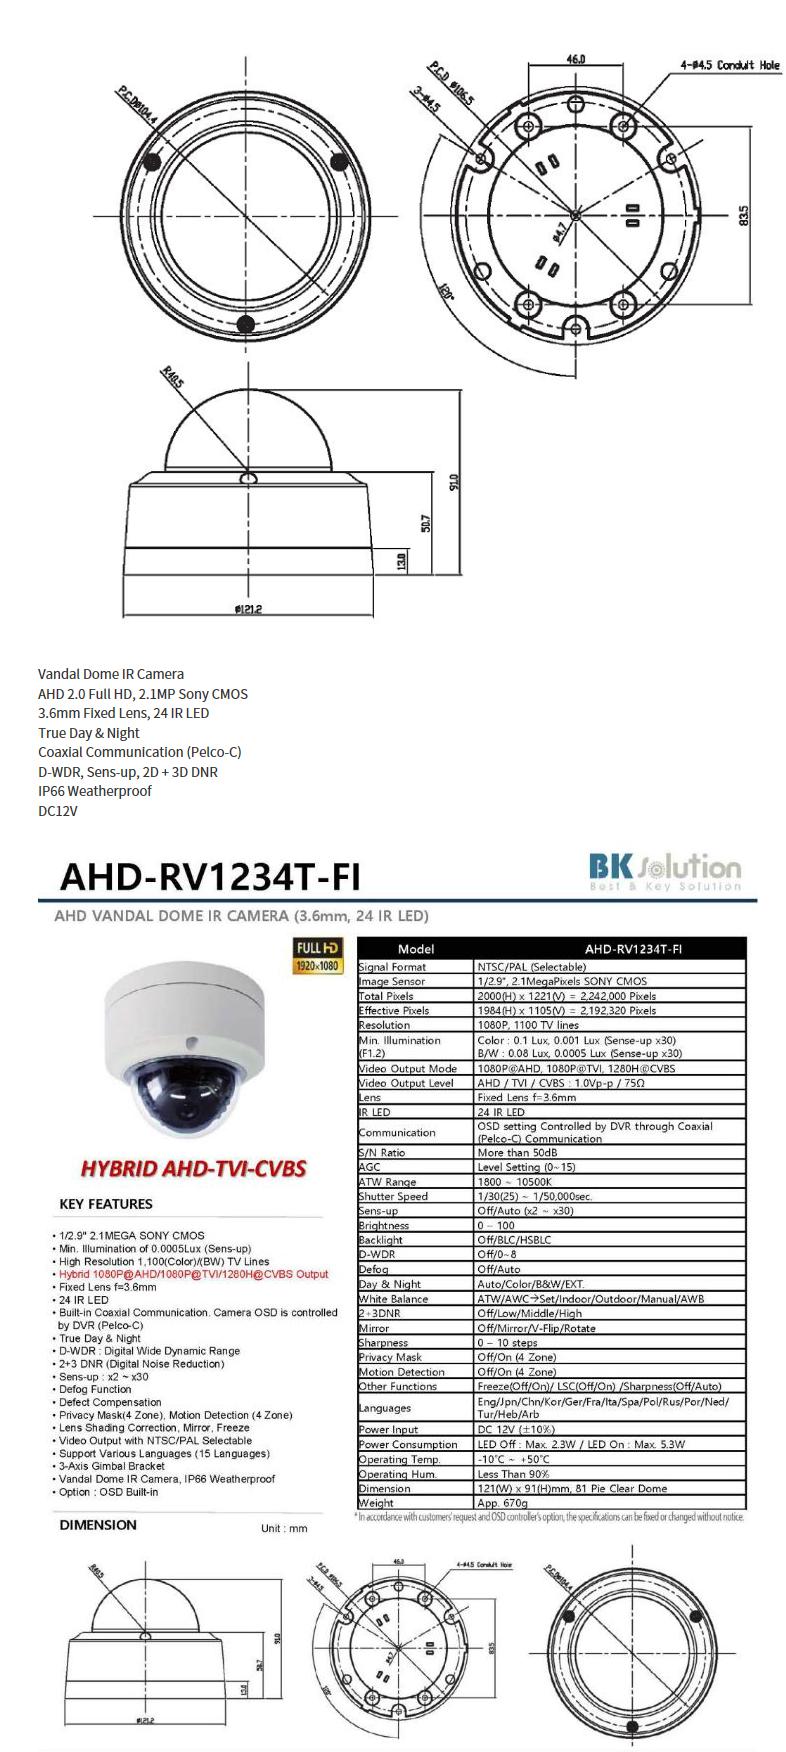 Bk Solution  AHD-RV1234T-FI